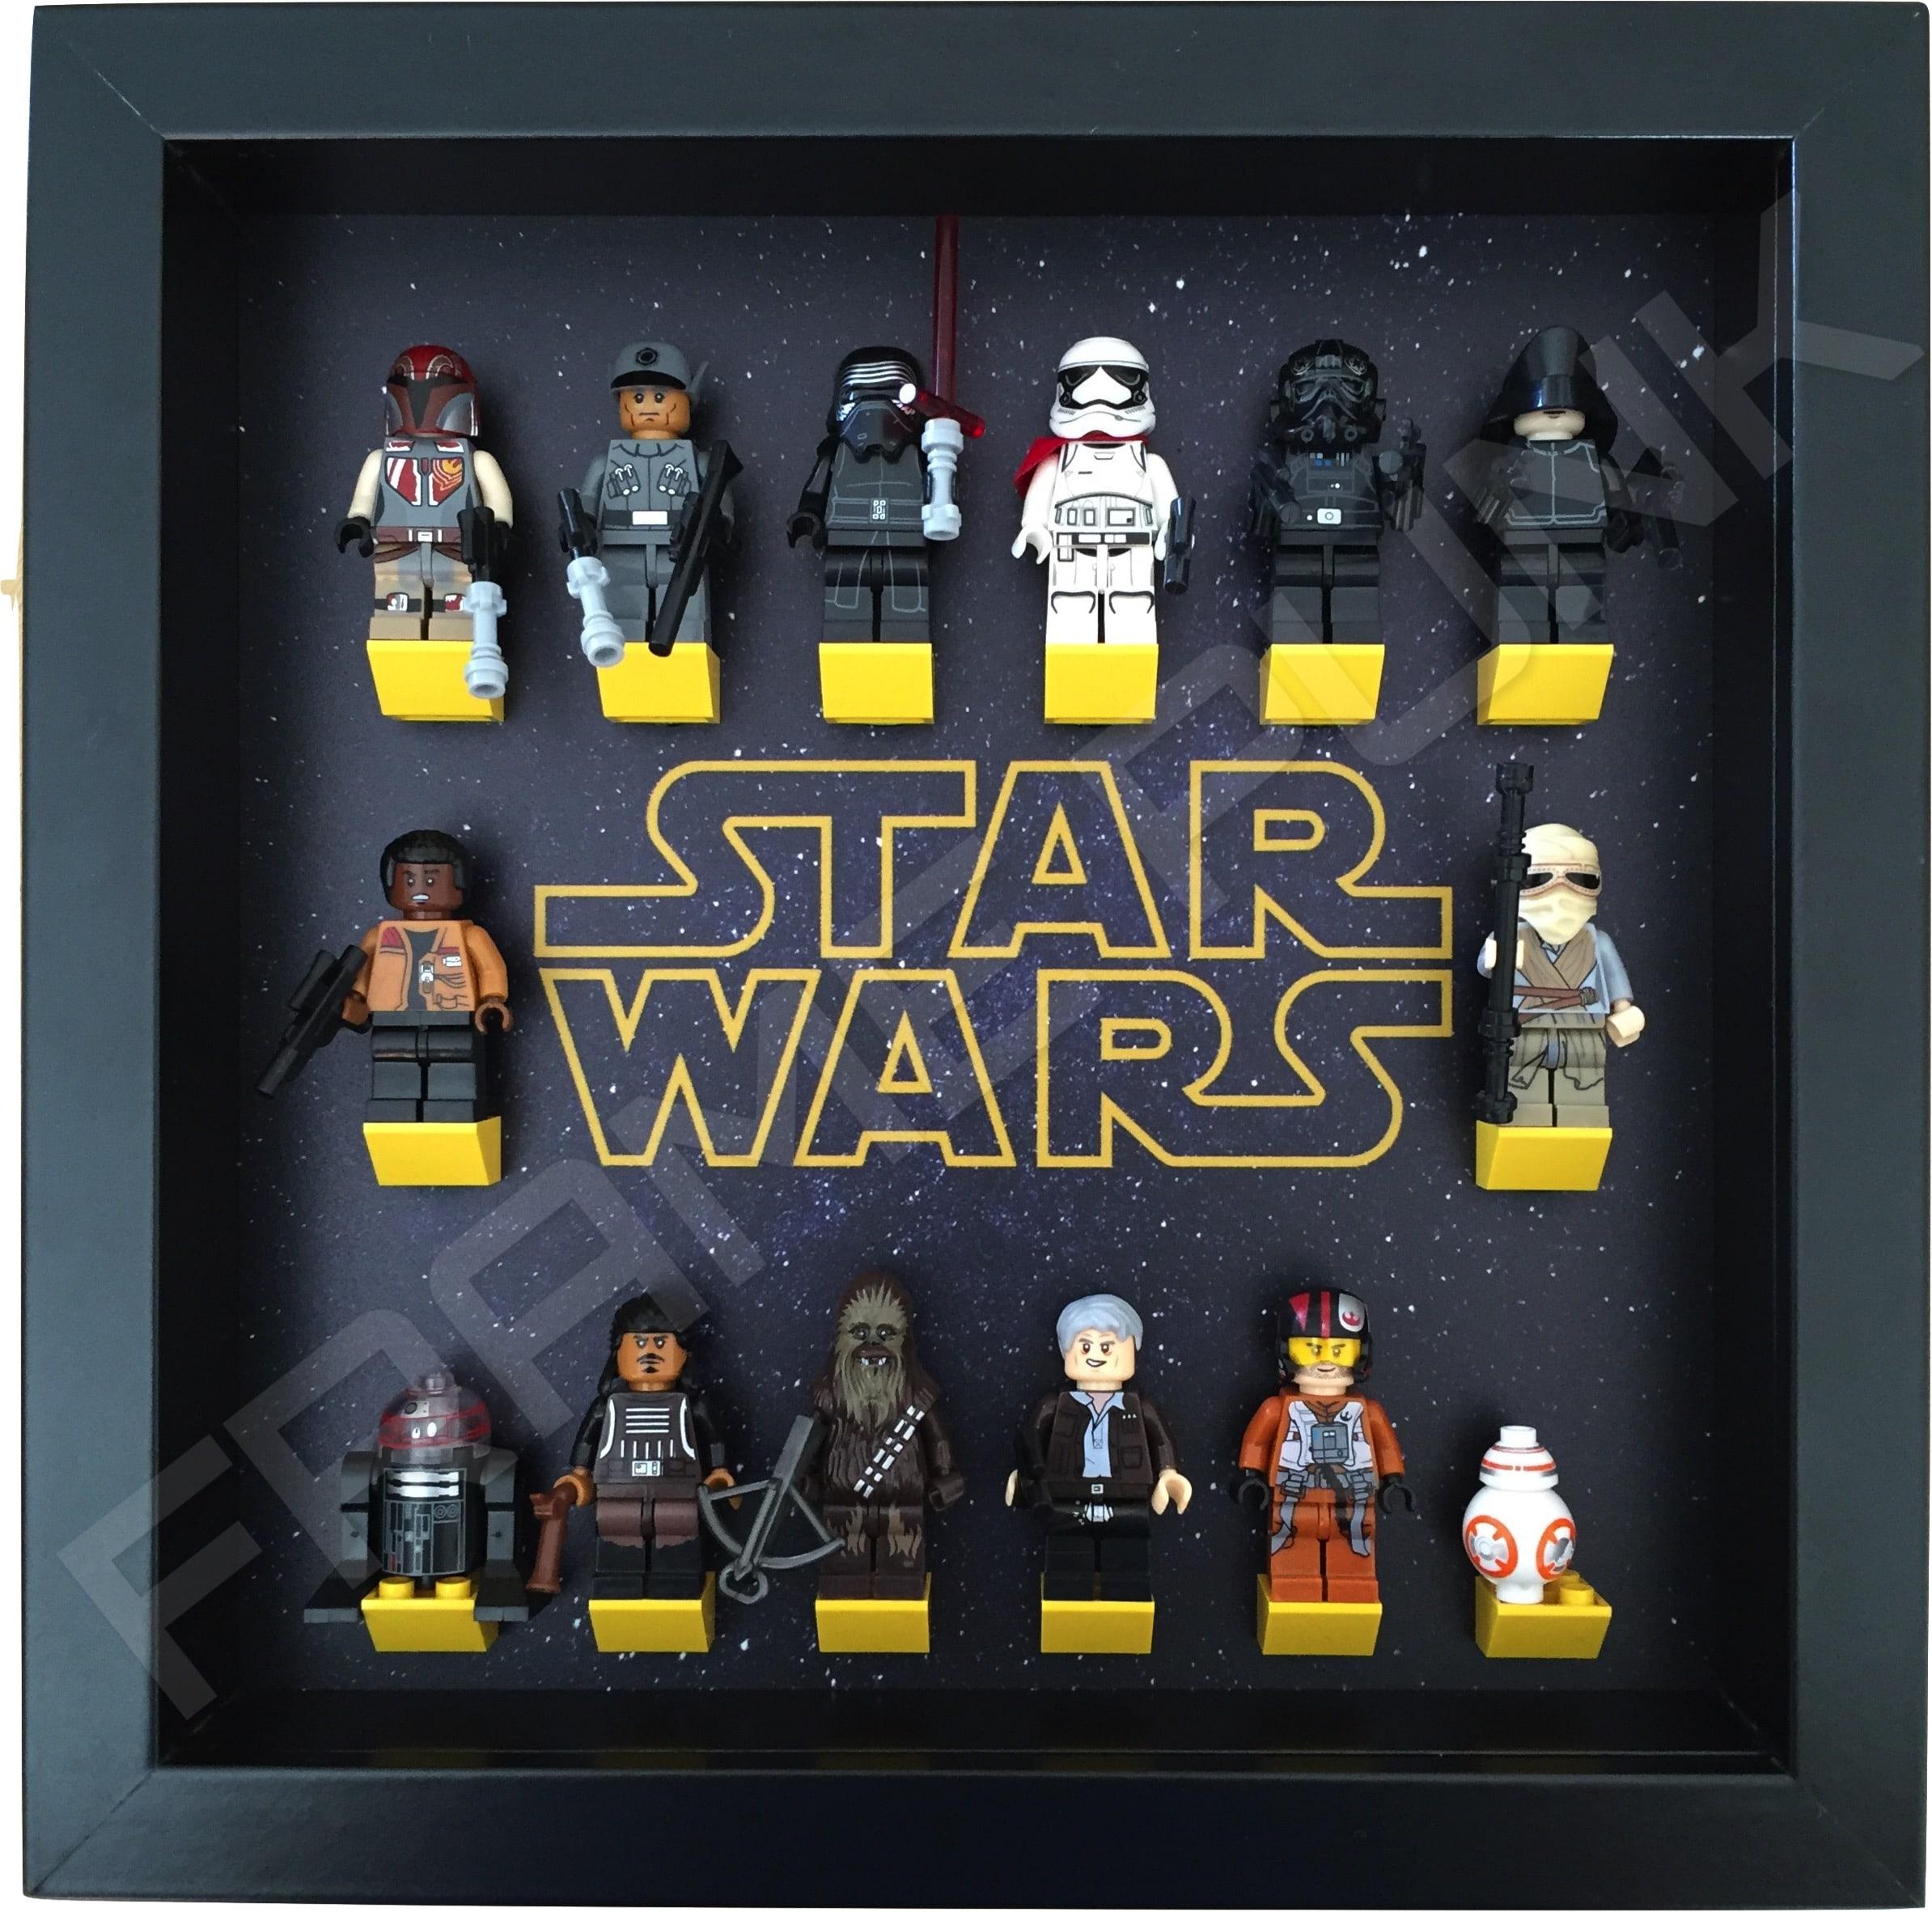 Star wars lego minifigure display frame frame punk - Image star wars lego ...